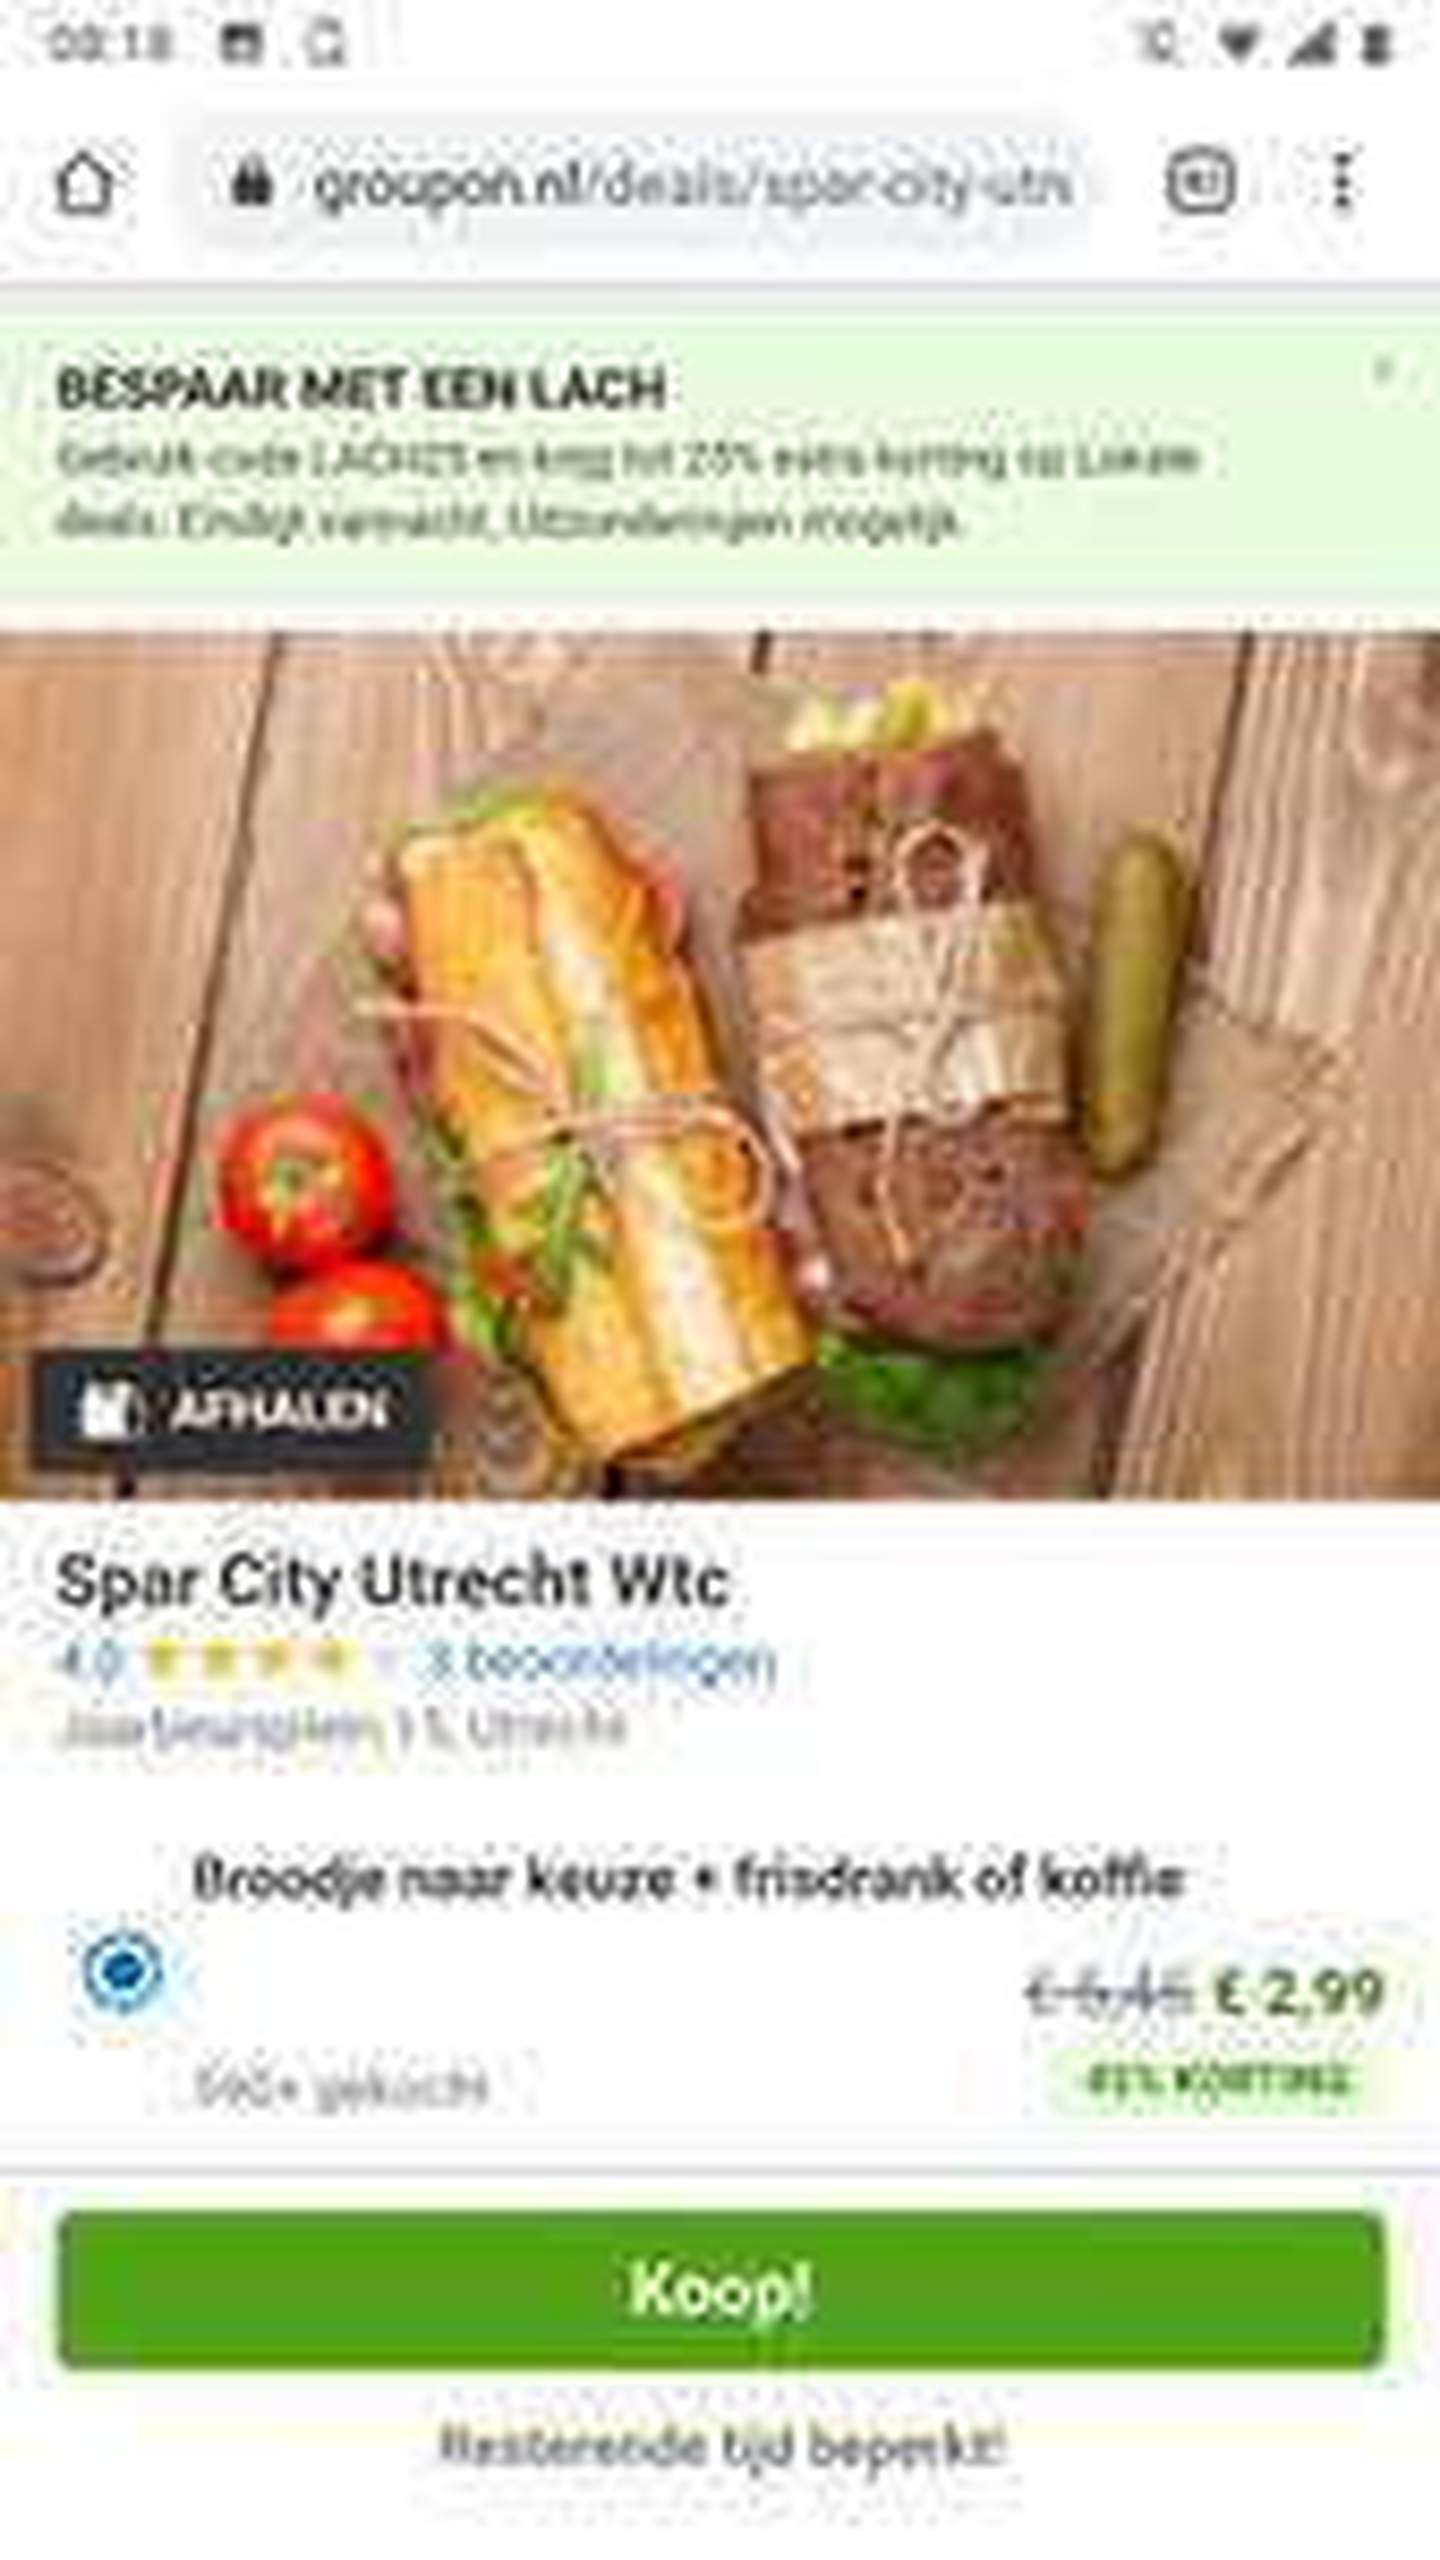 Broodje en drankje bij Spar City Utrecht WTC